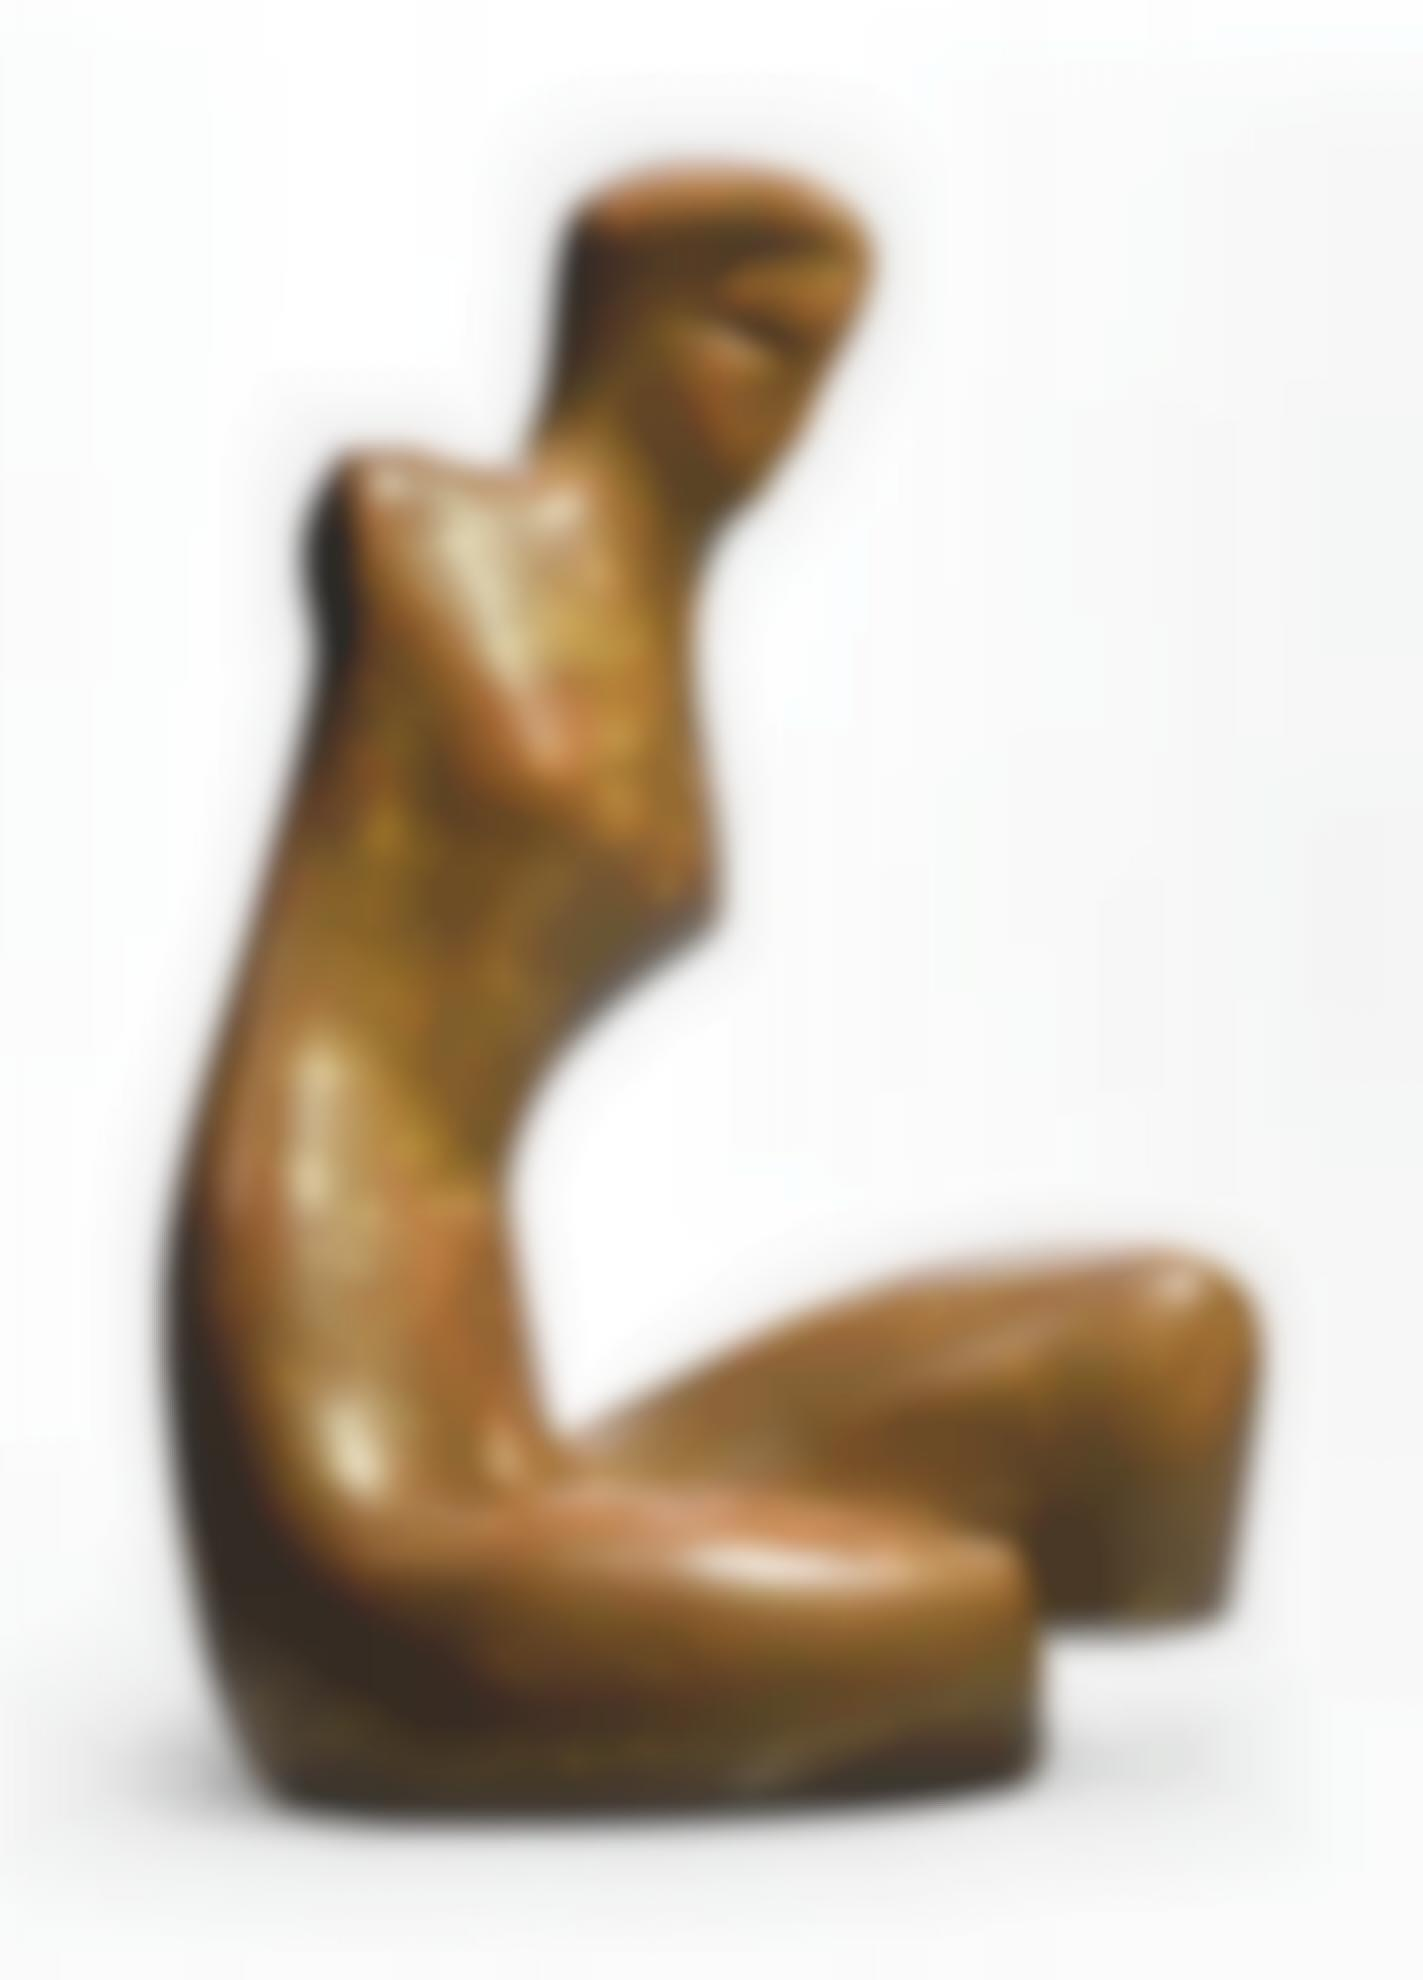 Alexander Archipenko-Seated Figure-1936